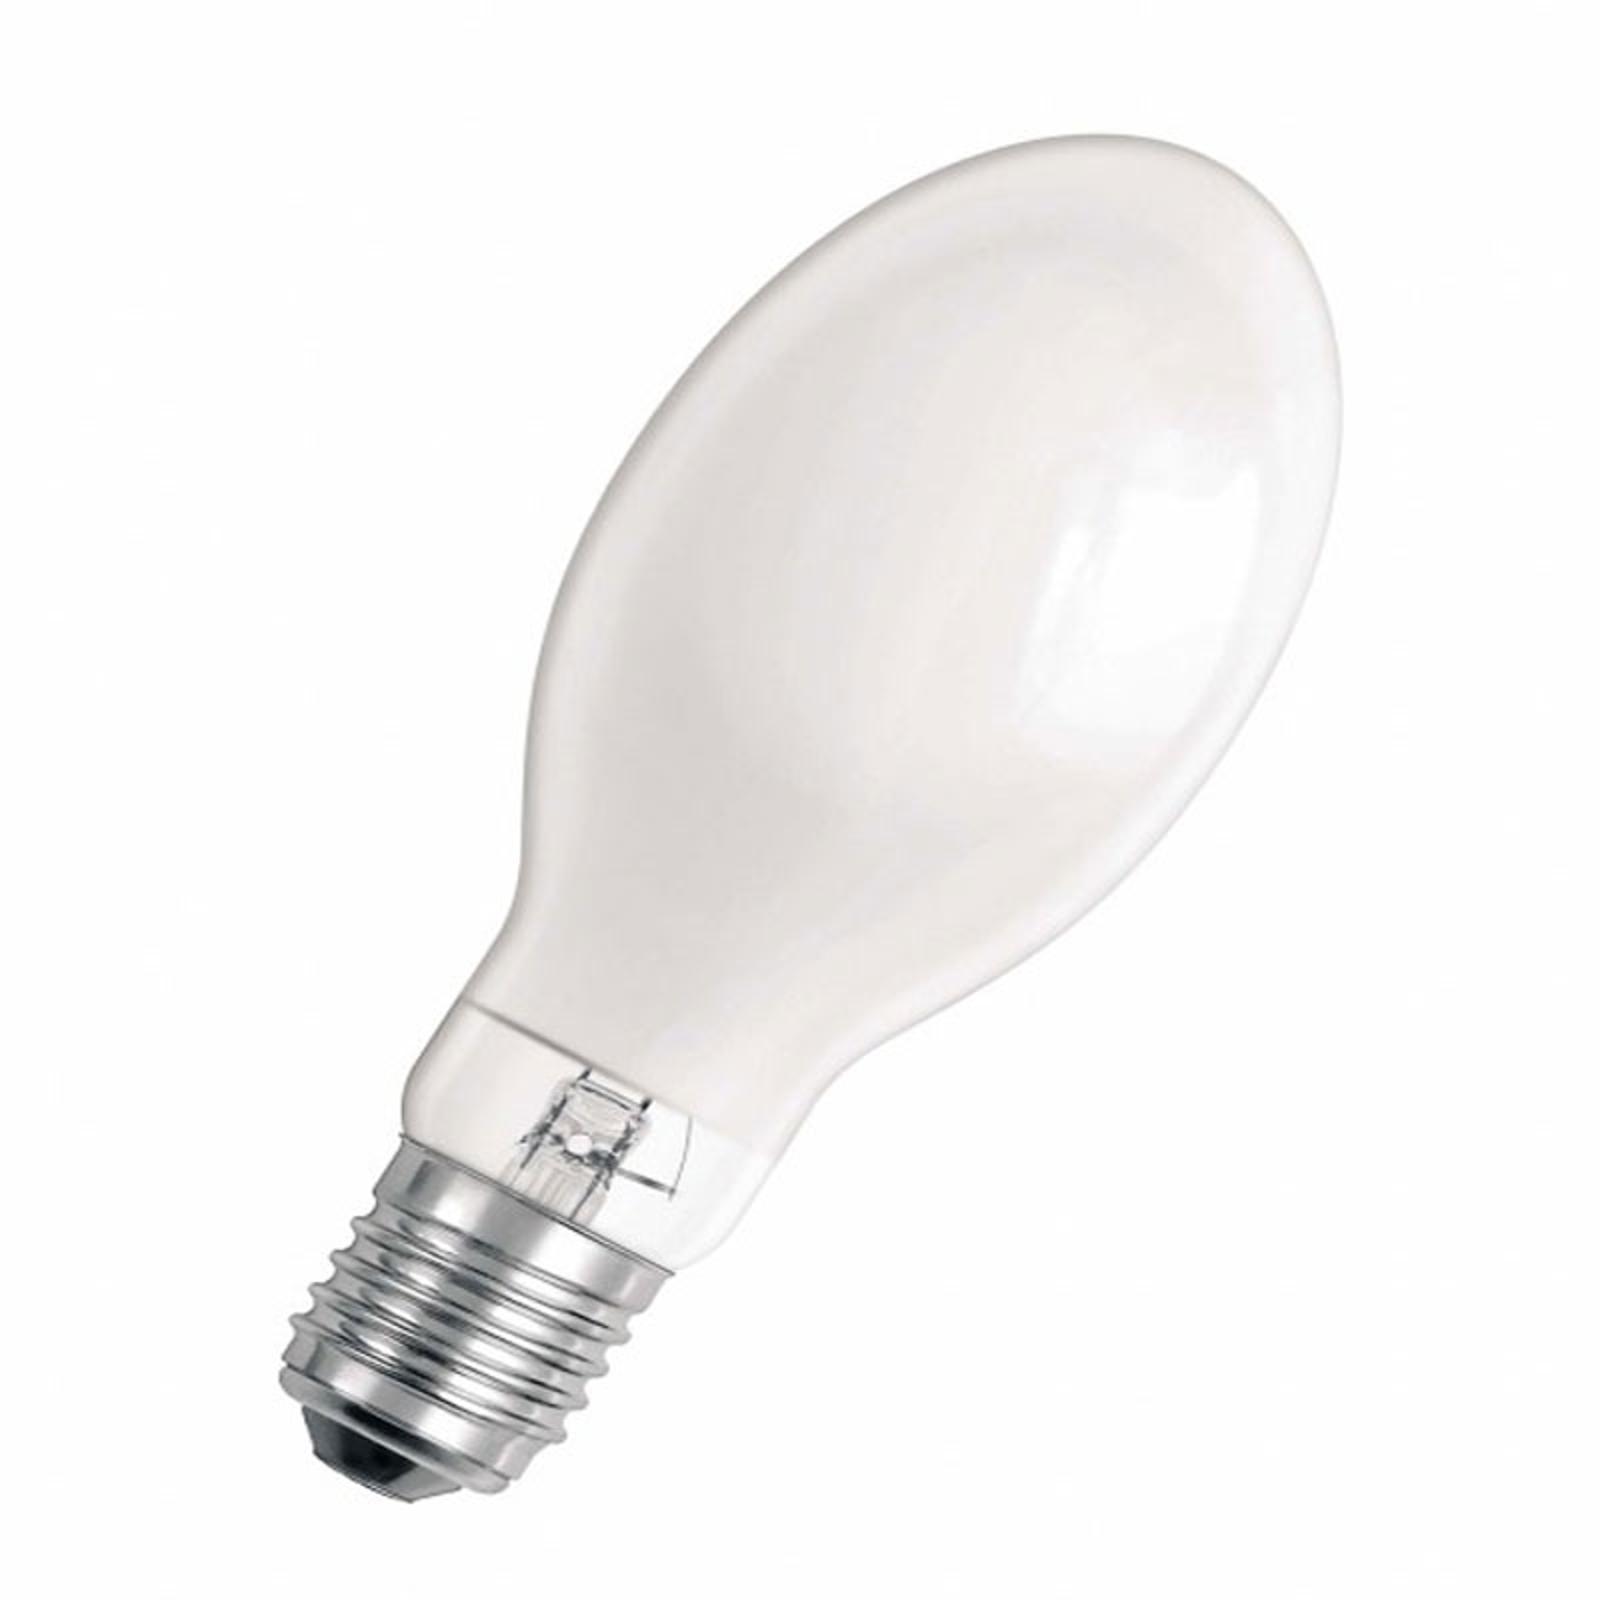 E27 35W 830 Powerball HCI-ET lampa metalohalogen.